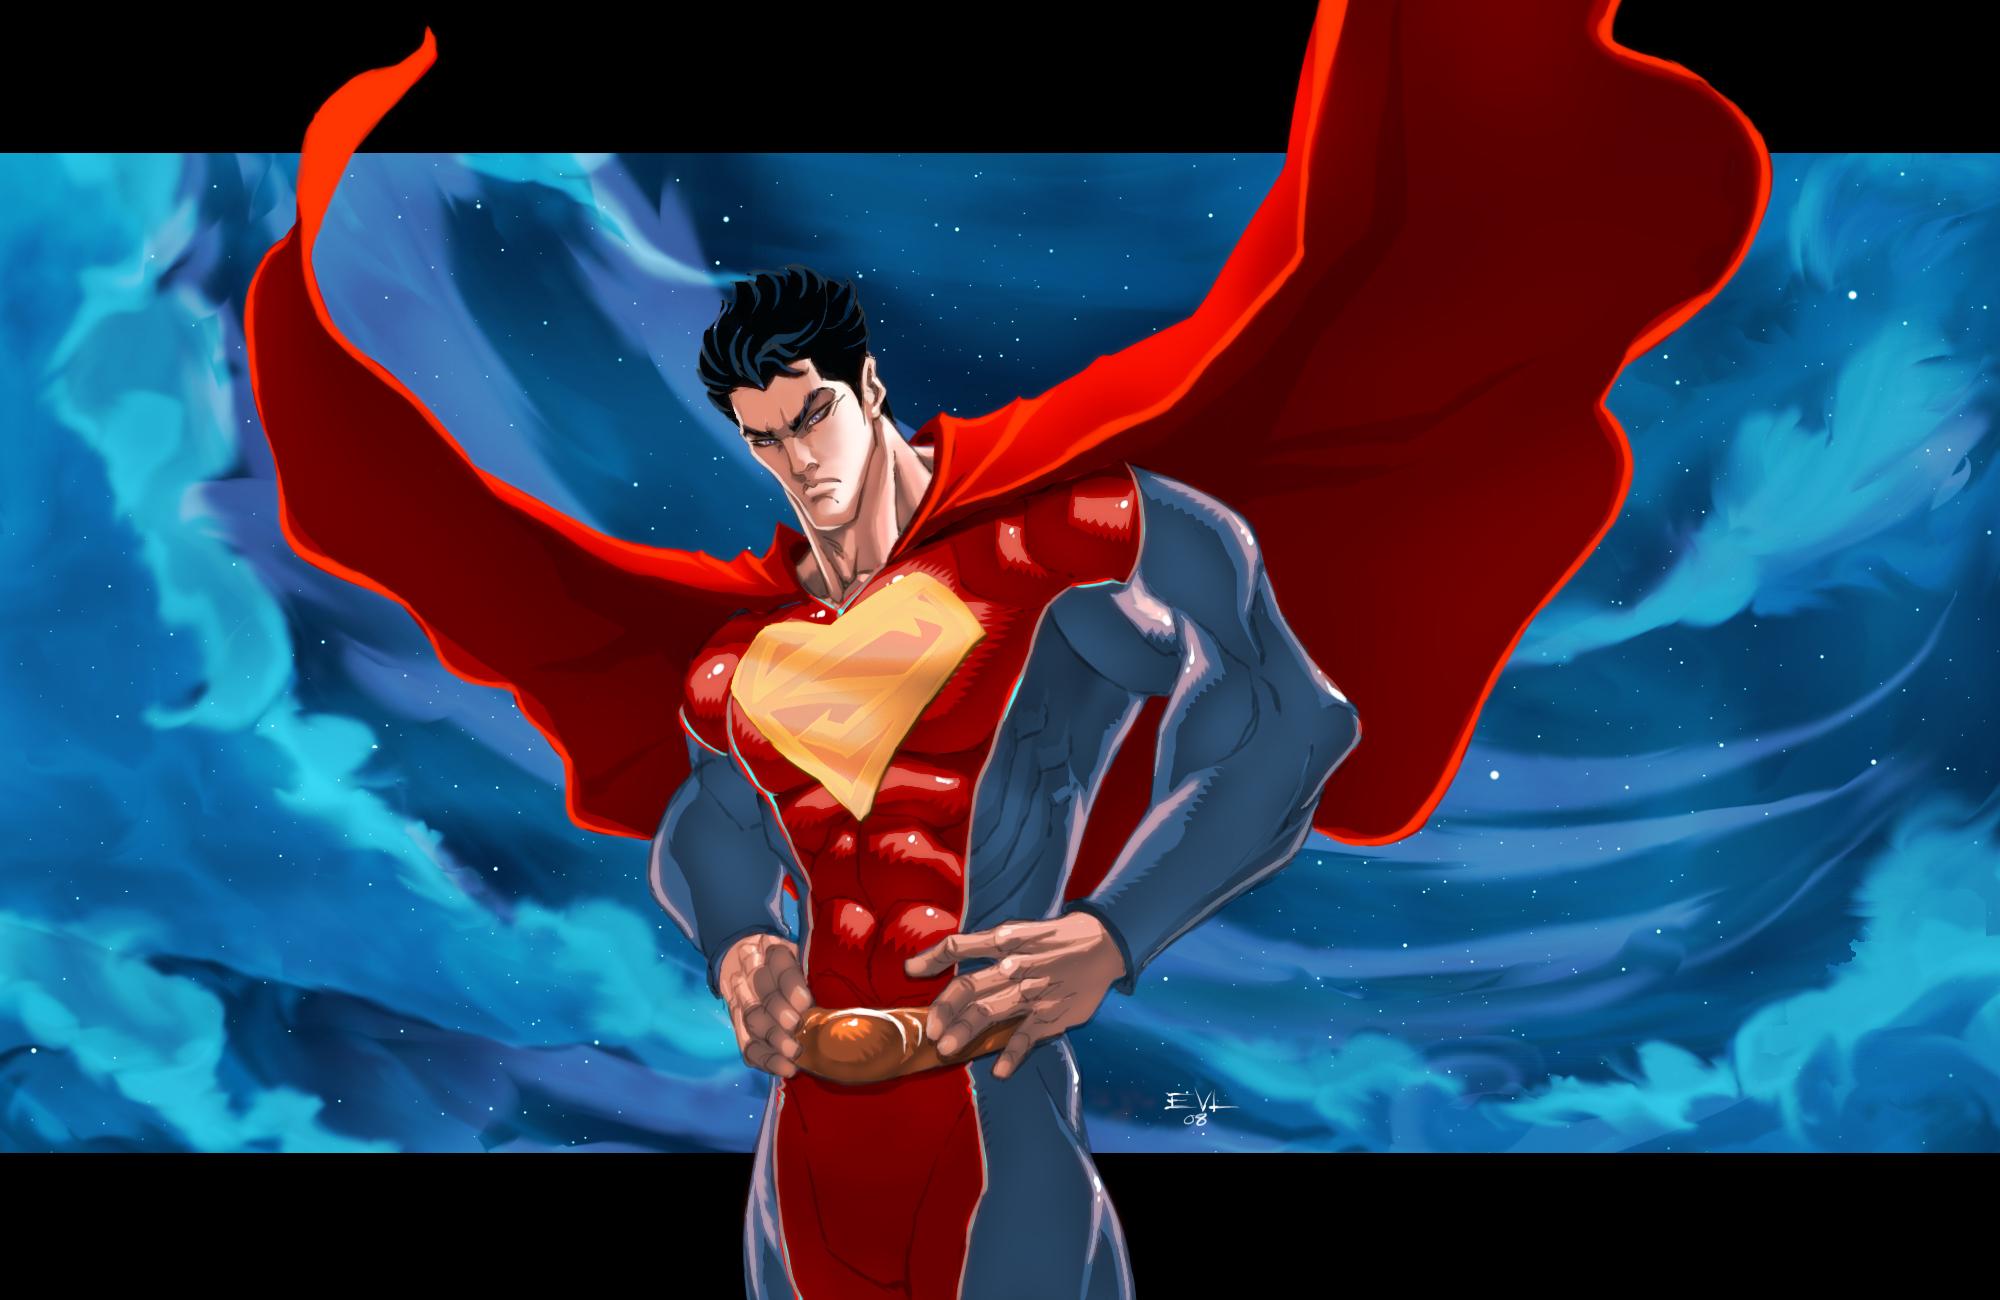 Wallpaper Abyss Explore the Collection Superman Comics Superman 62380 2000x1300